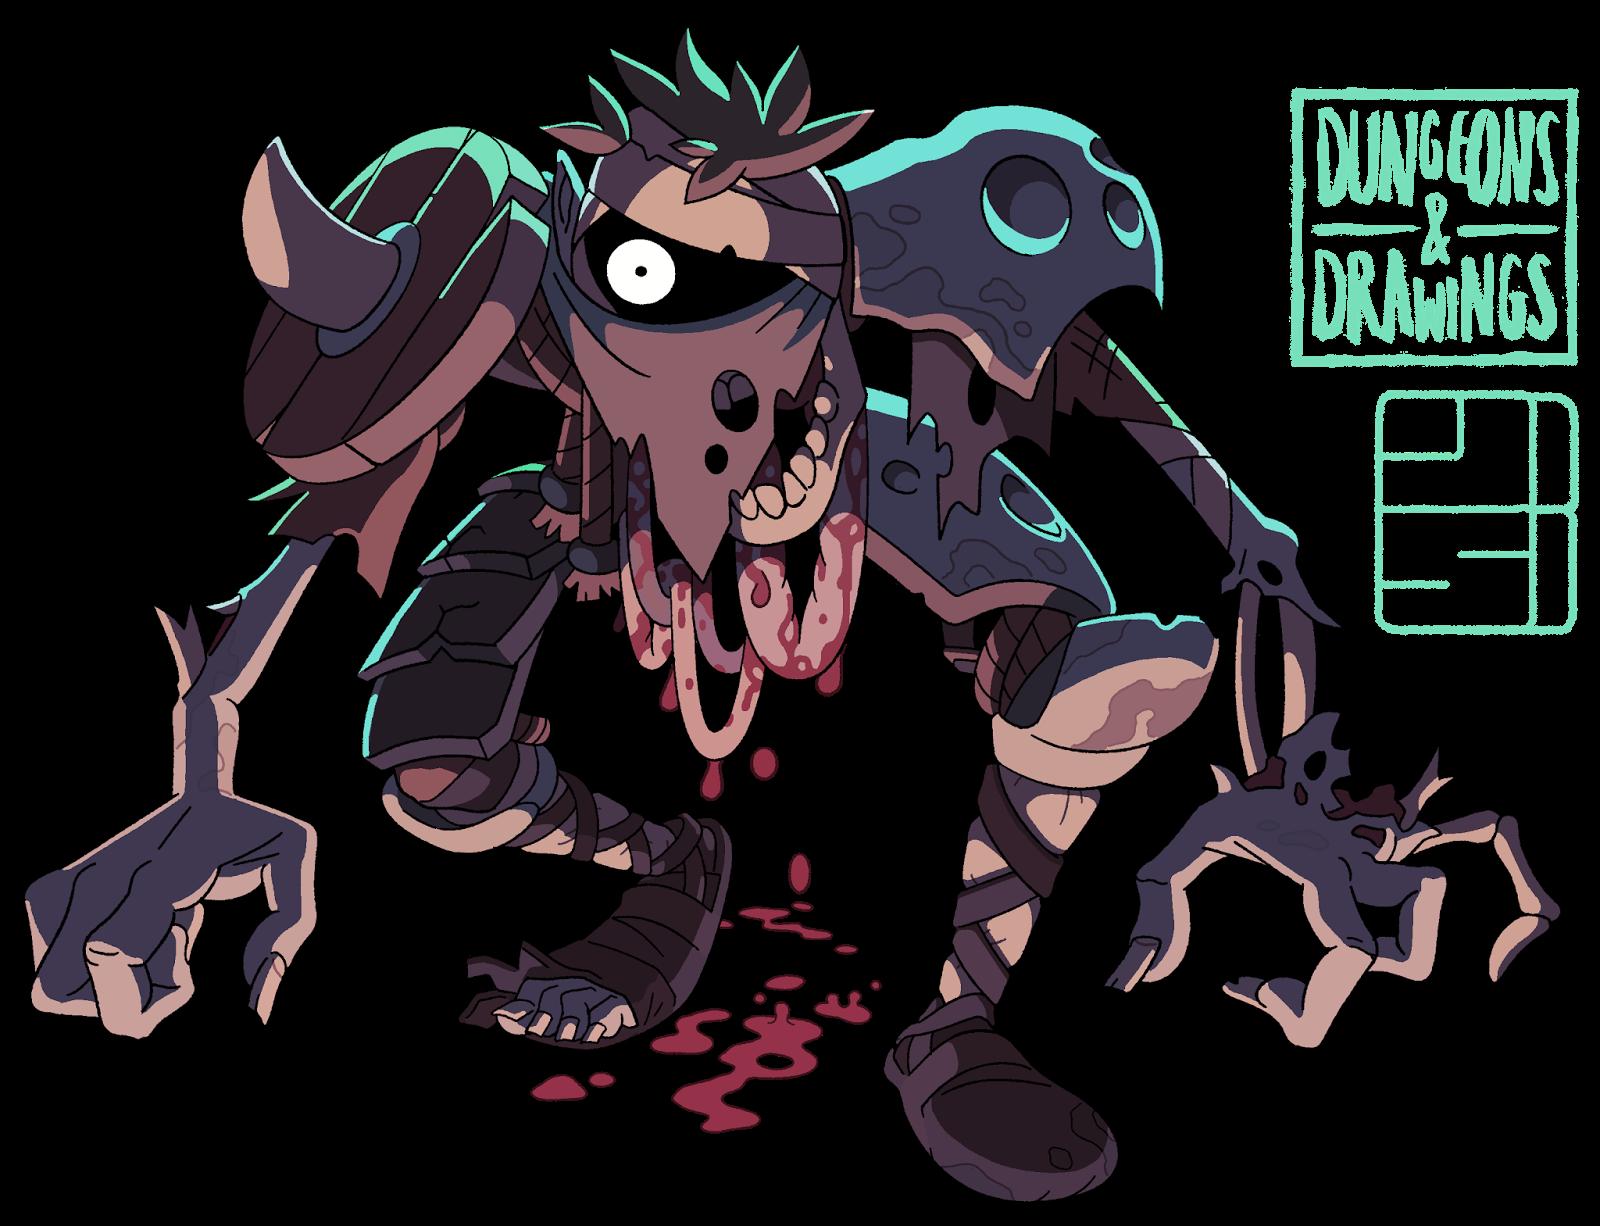 "dungeonsanddrawings ""Zombie"" - by Joe Sparrow dungeonsanddrawings.blogspot.com (2017-10) © dell'autore tutti i diritti riservati"